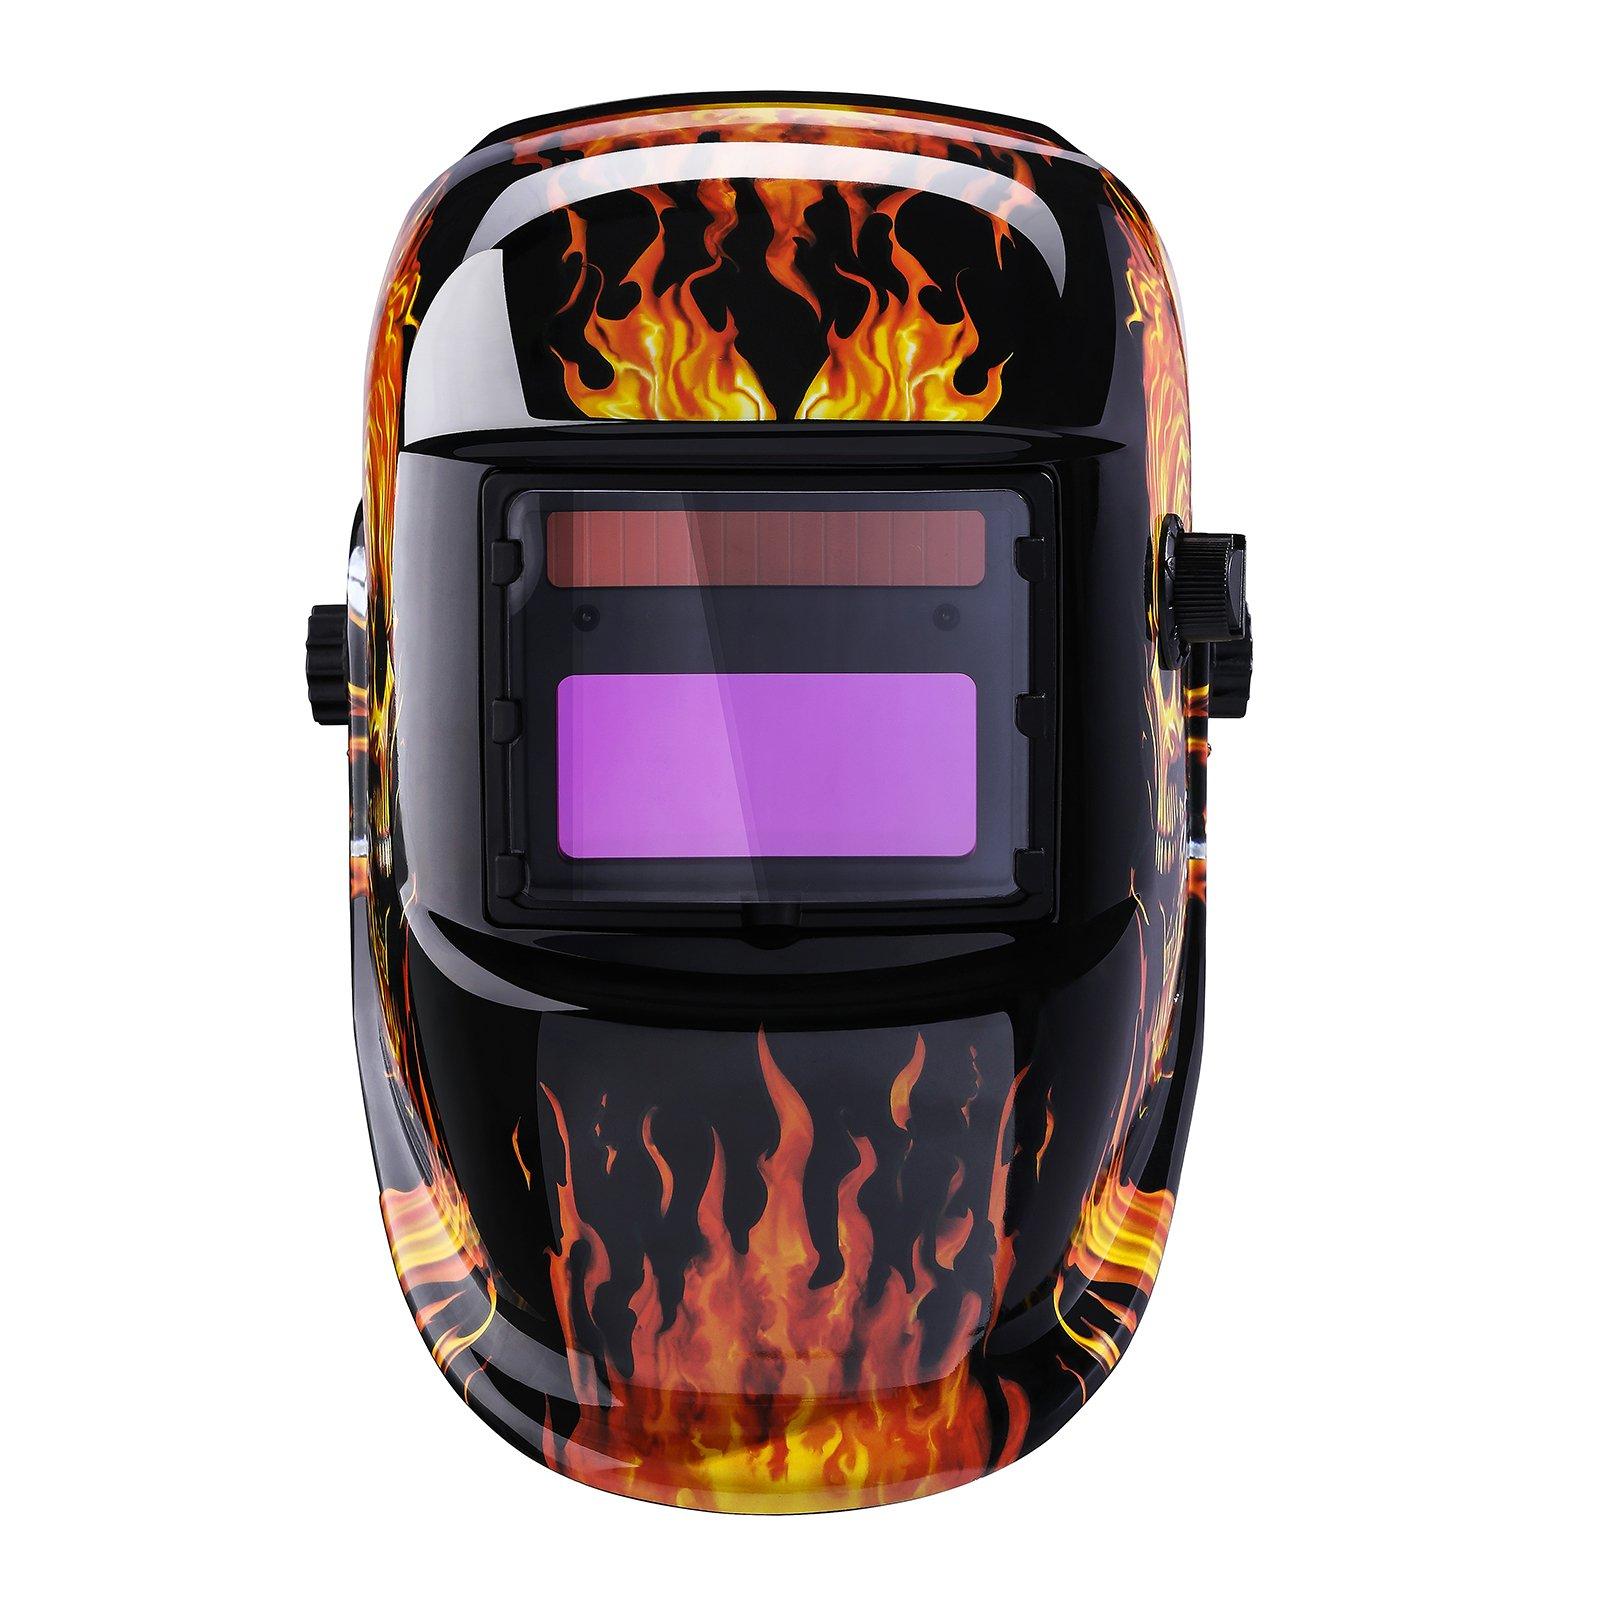 Solar Powered Welding Helmet Auto Darkening Professional Hood with Wide Lens Adjustable Shade Range by DEKOPRO (Image #3)